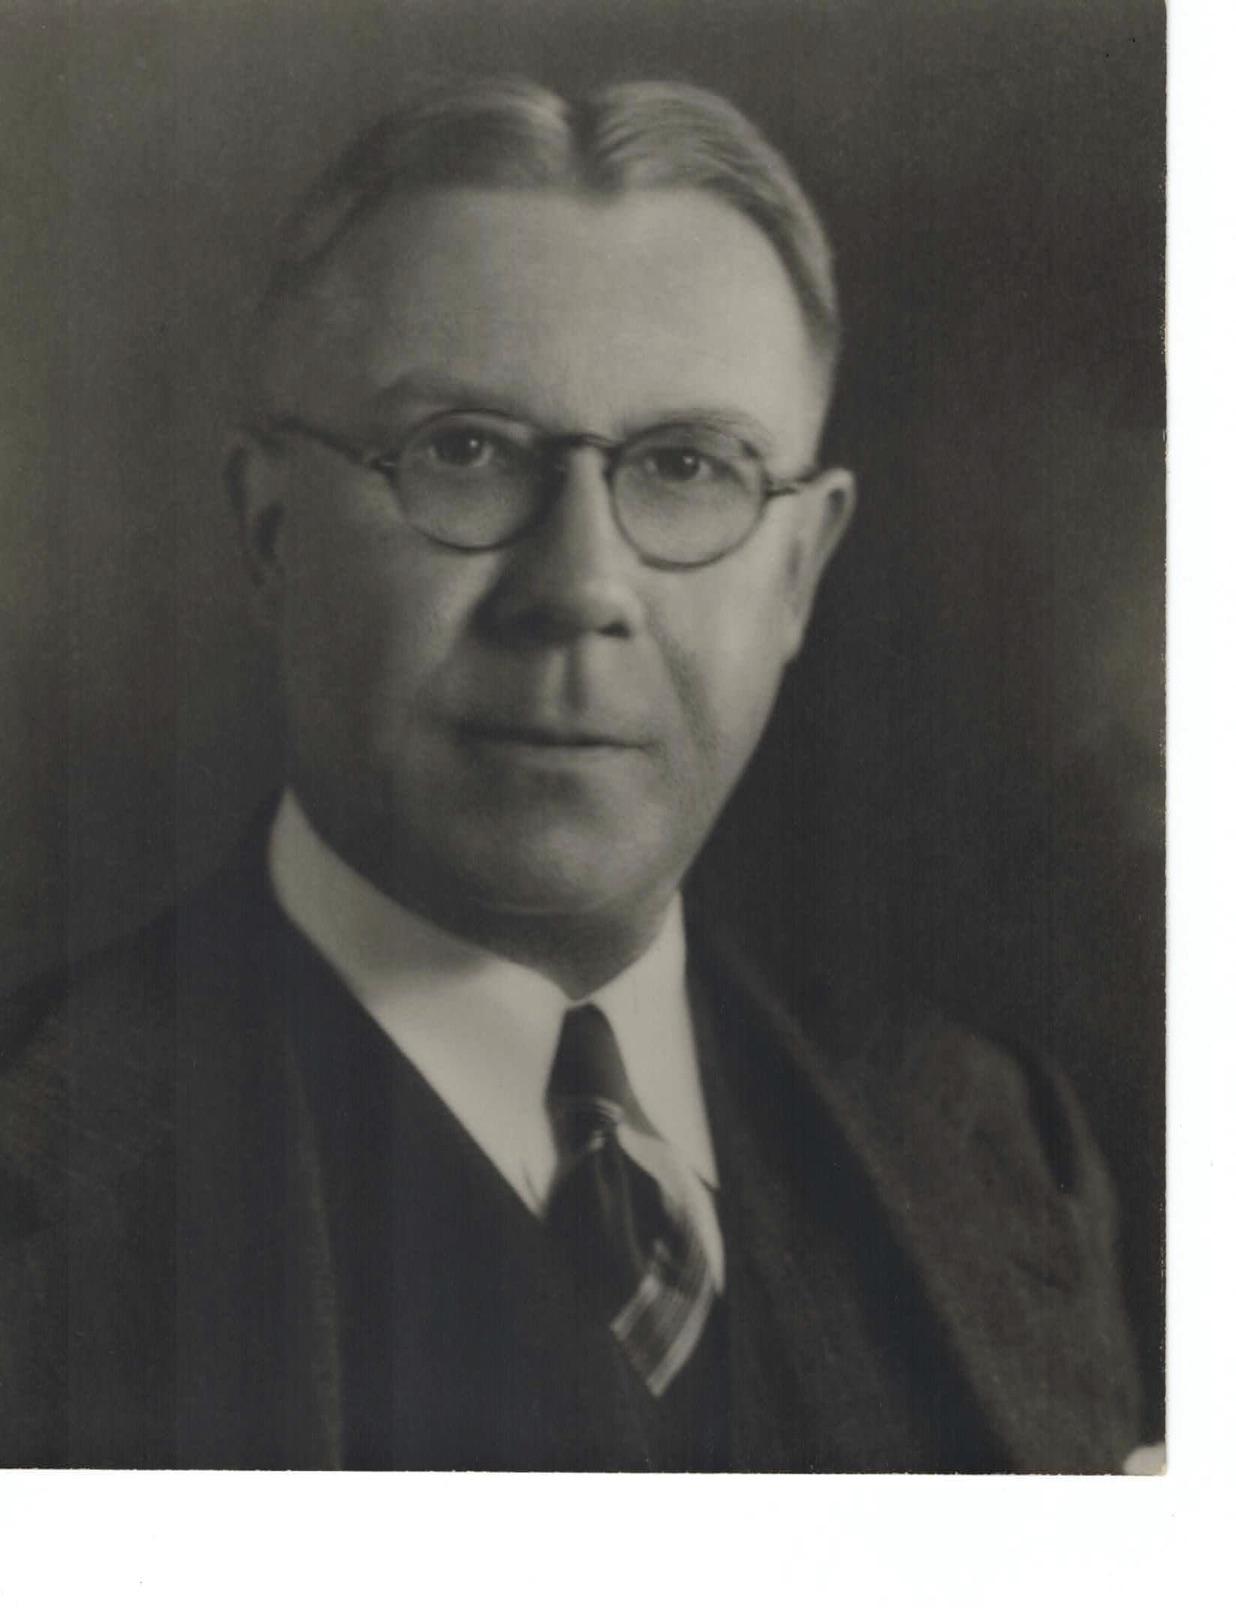 ALBERT H. BEEBE 1919-20